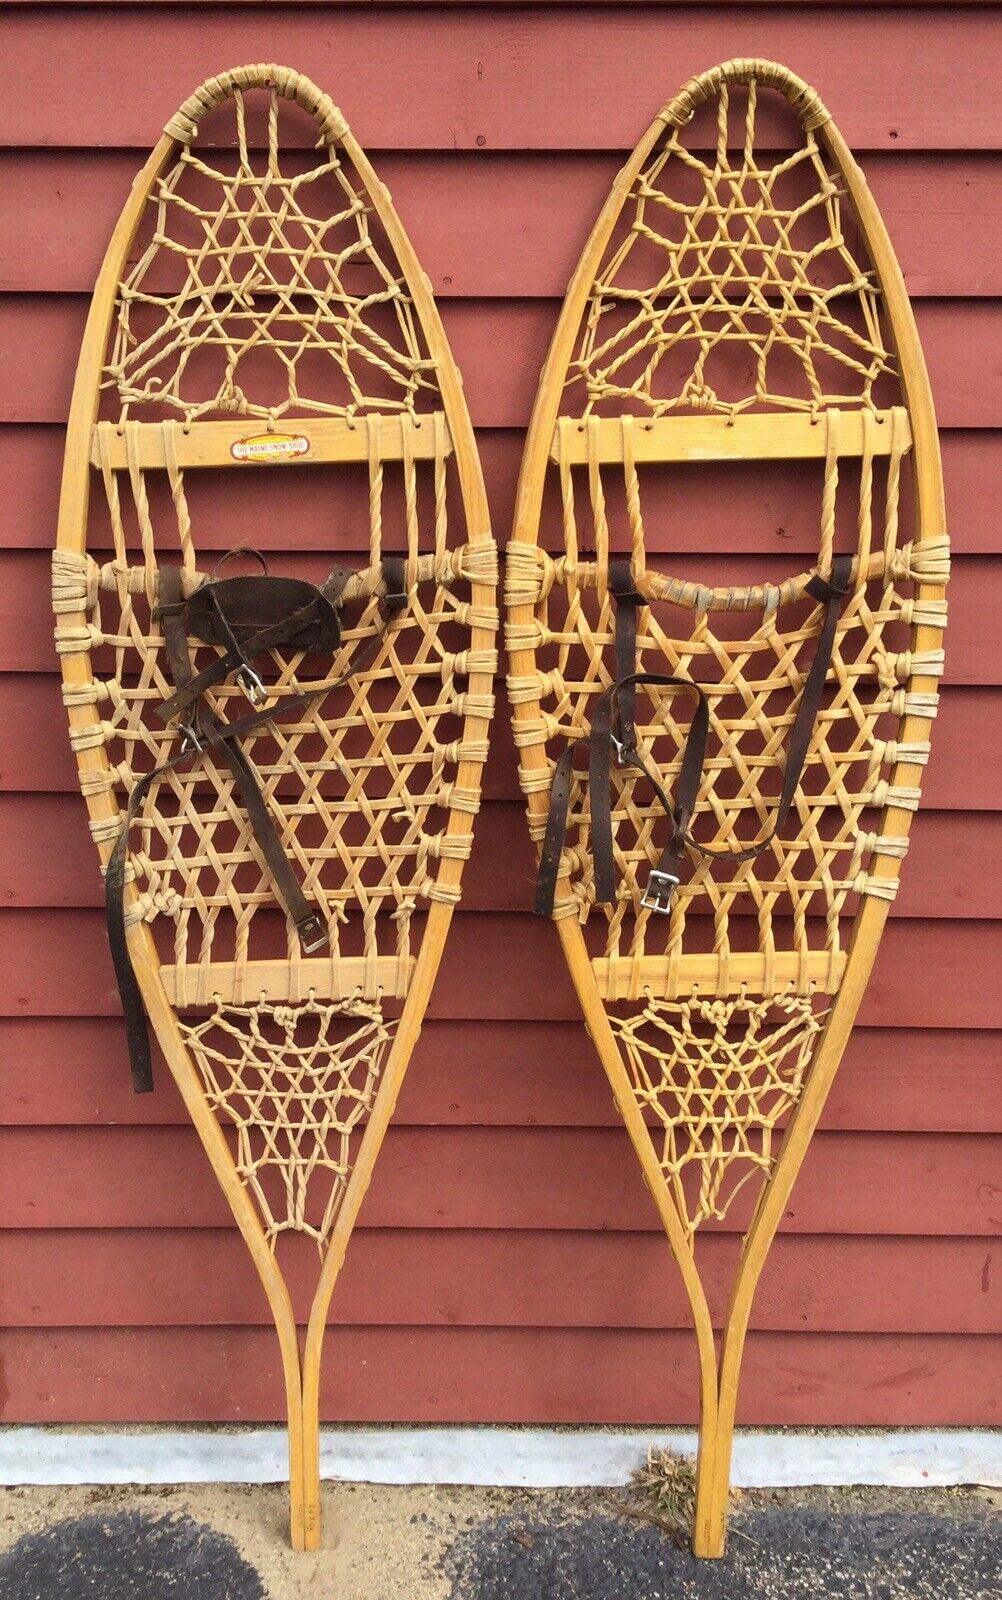 Pair Of Vintage Wooden LL BEAN Snowschuhe FREEPORT MAINE Home Decor Display 14x48